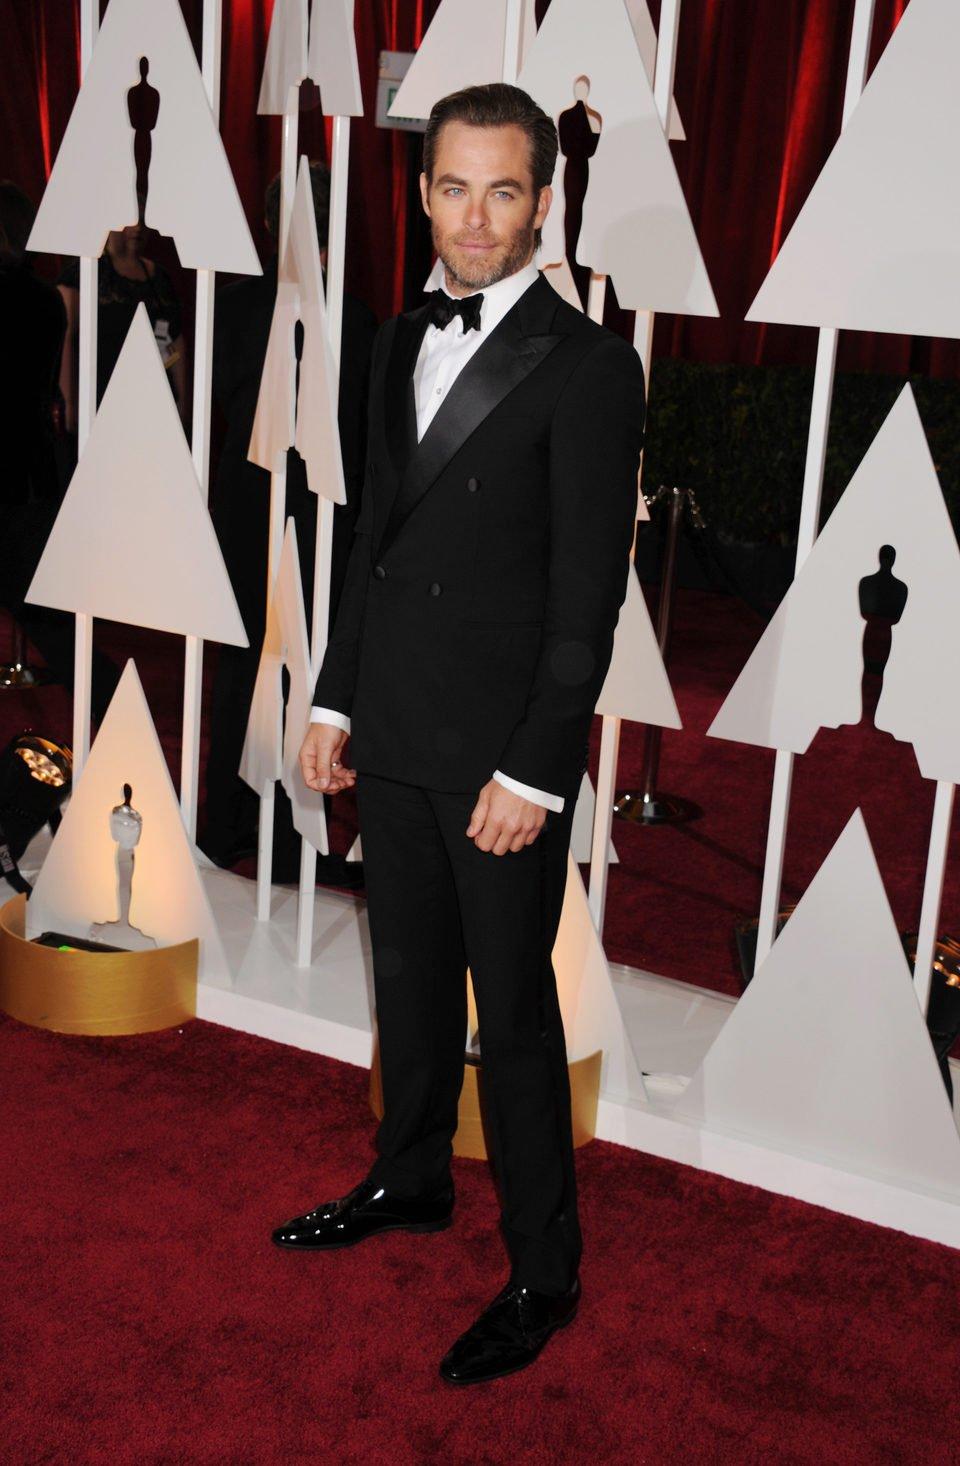 Chris Pine posse in the Oscar 2015 red carpet